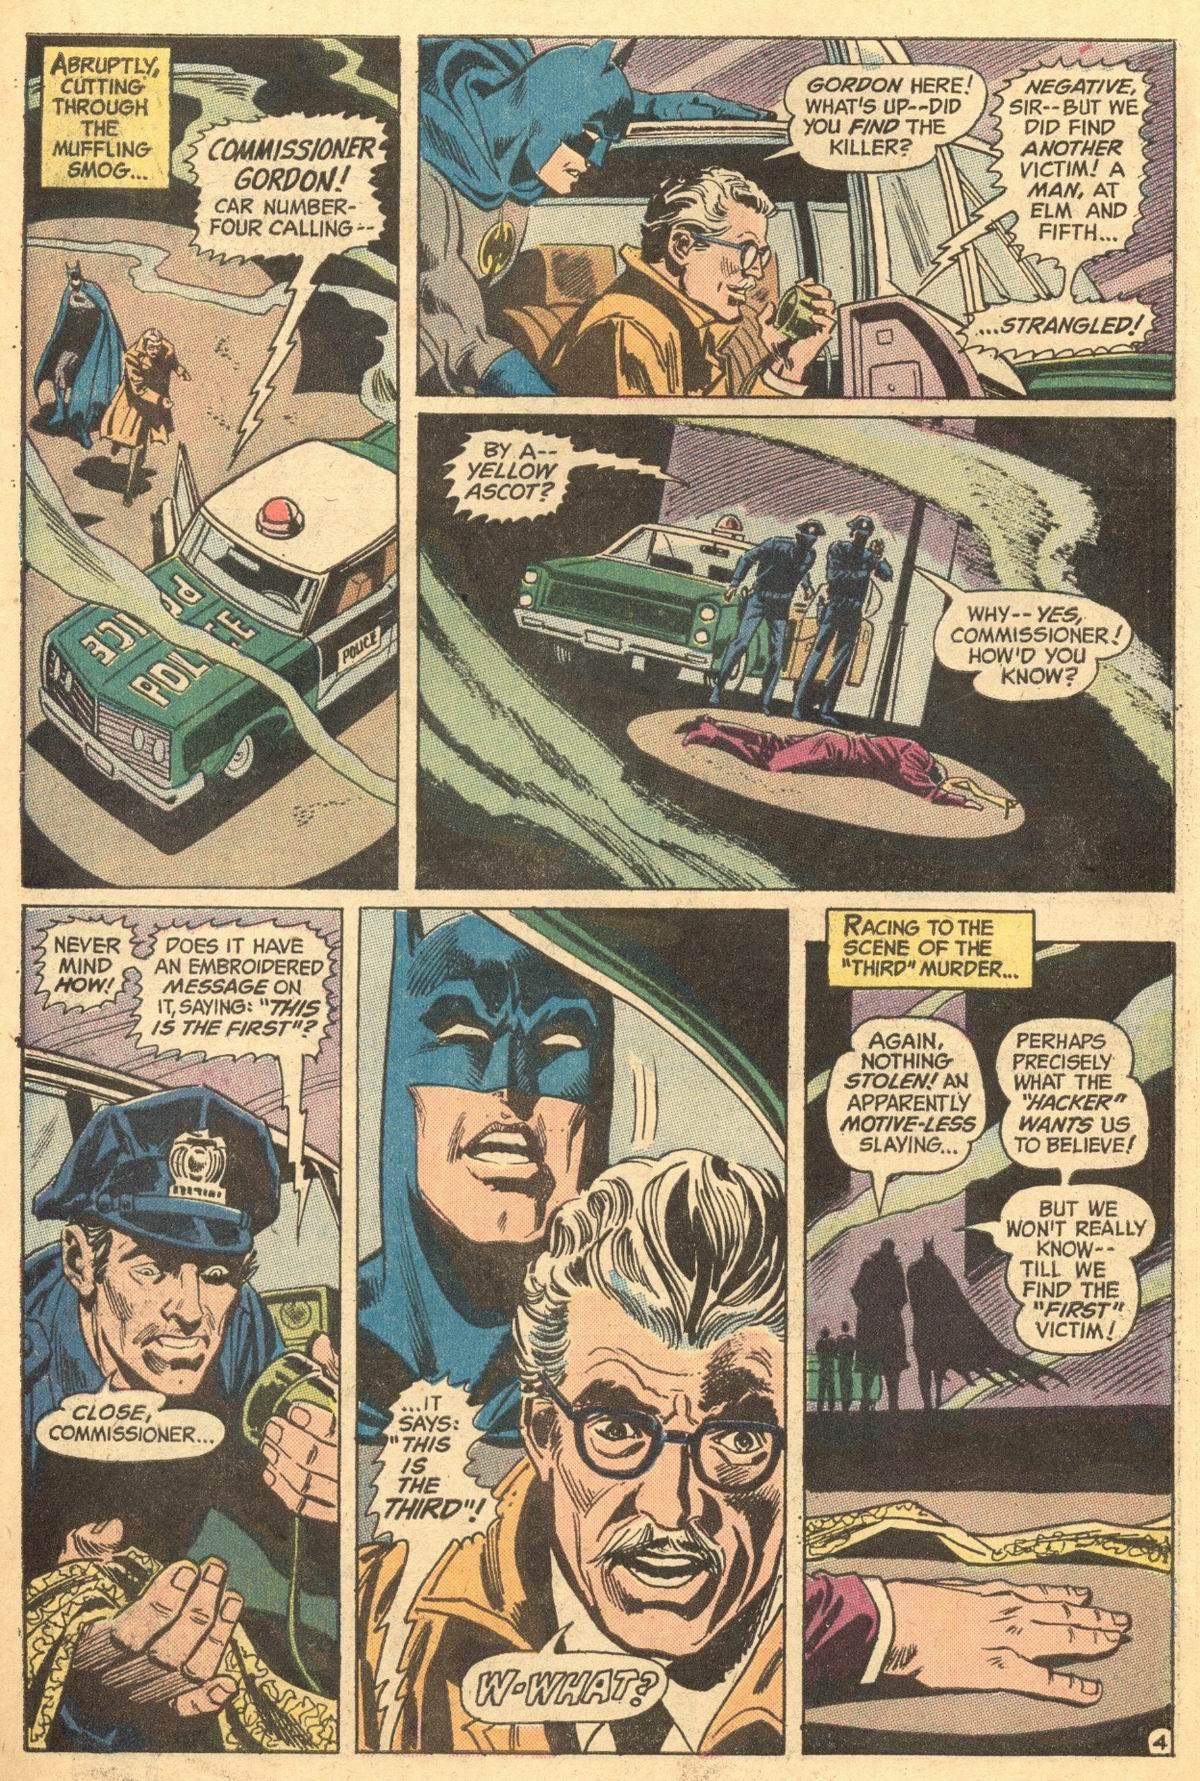 Detective Comics (1937) 433 Page 5